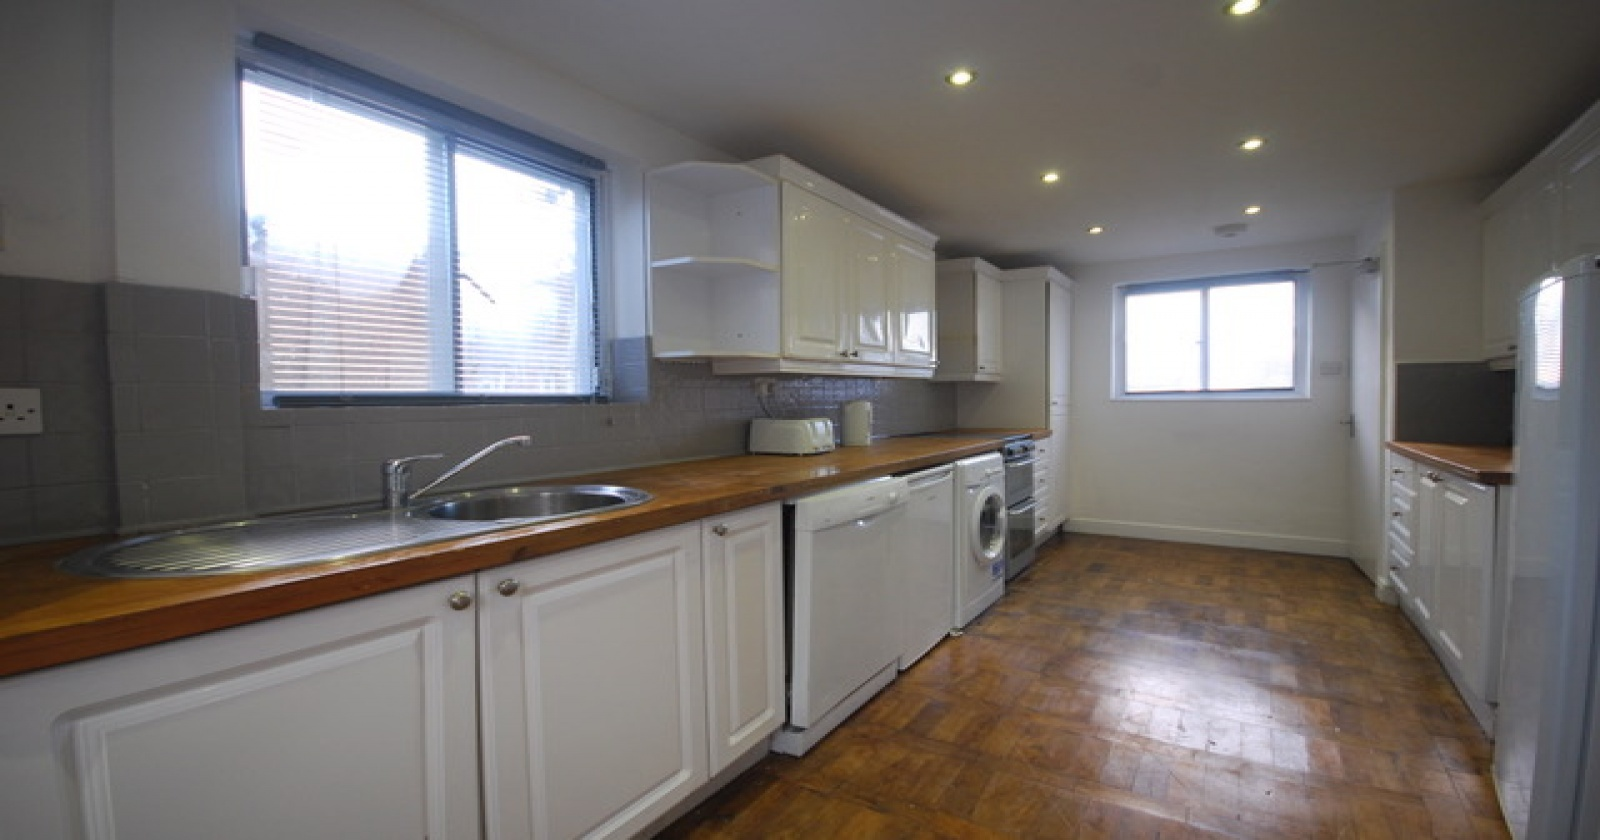 Stephens Road, Brighton, BN1 7ER, 5 Rooms Rooms,1 BathroomBathrooms,Room,For Rent,Stephens Road,1018